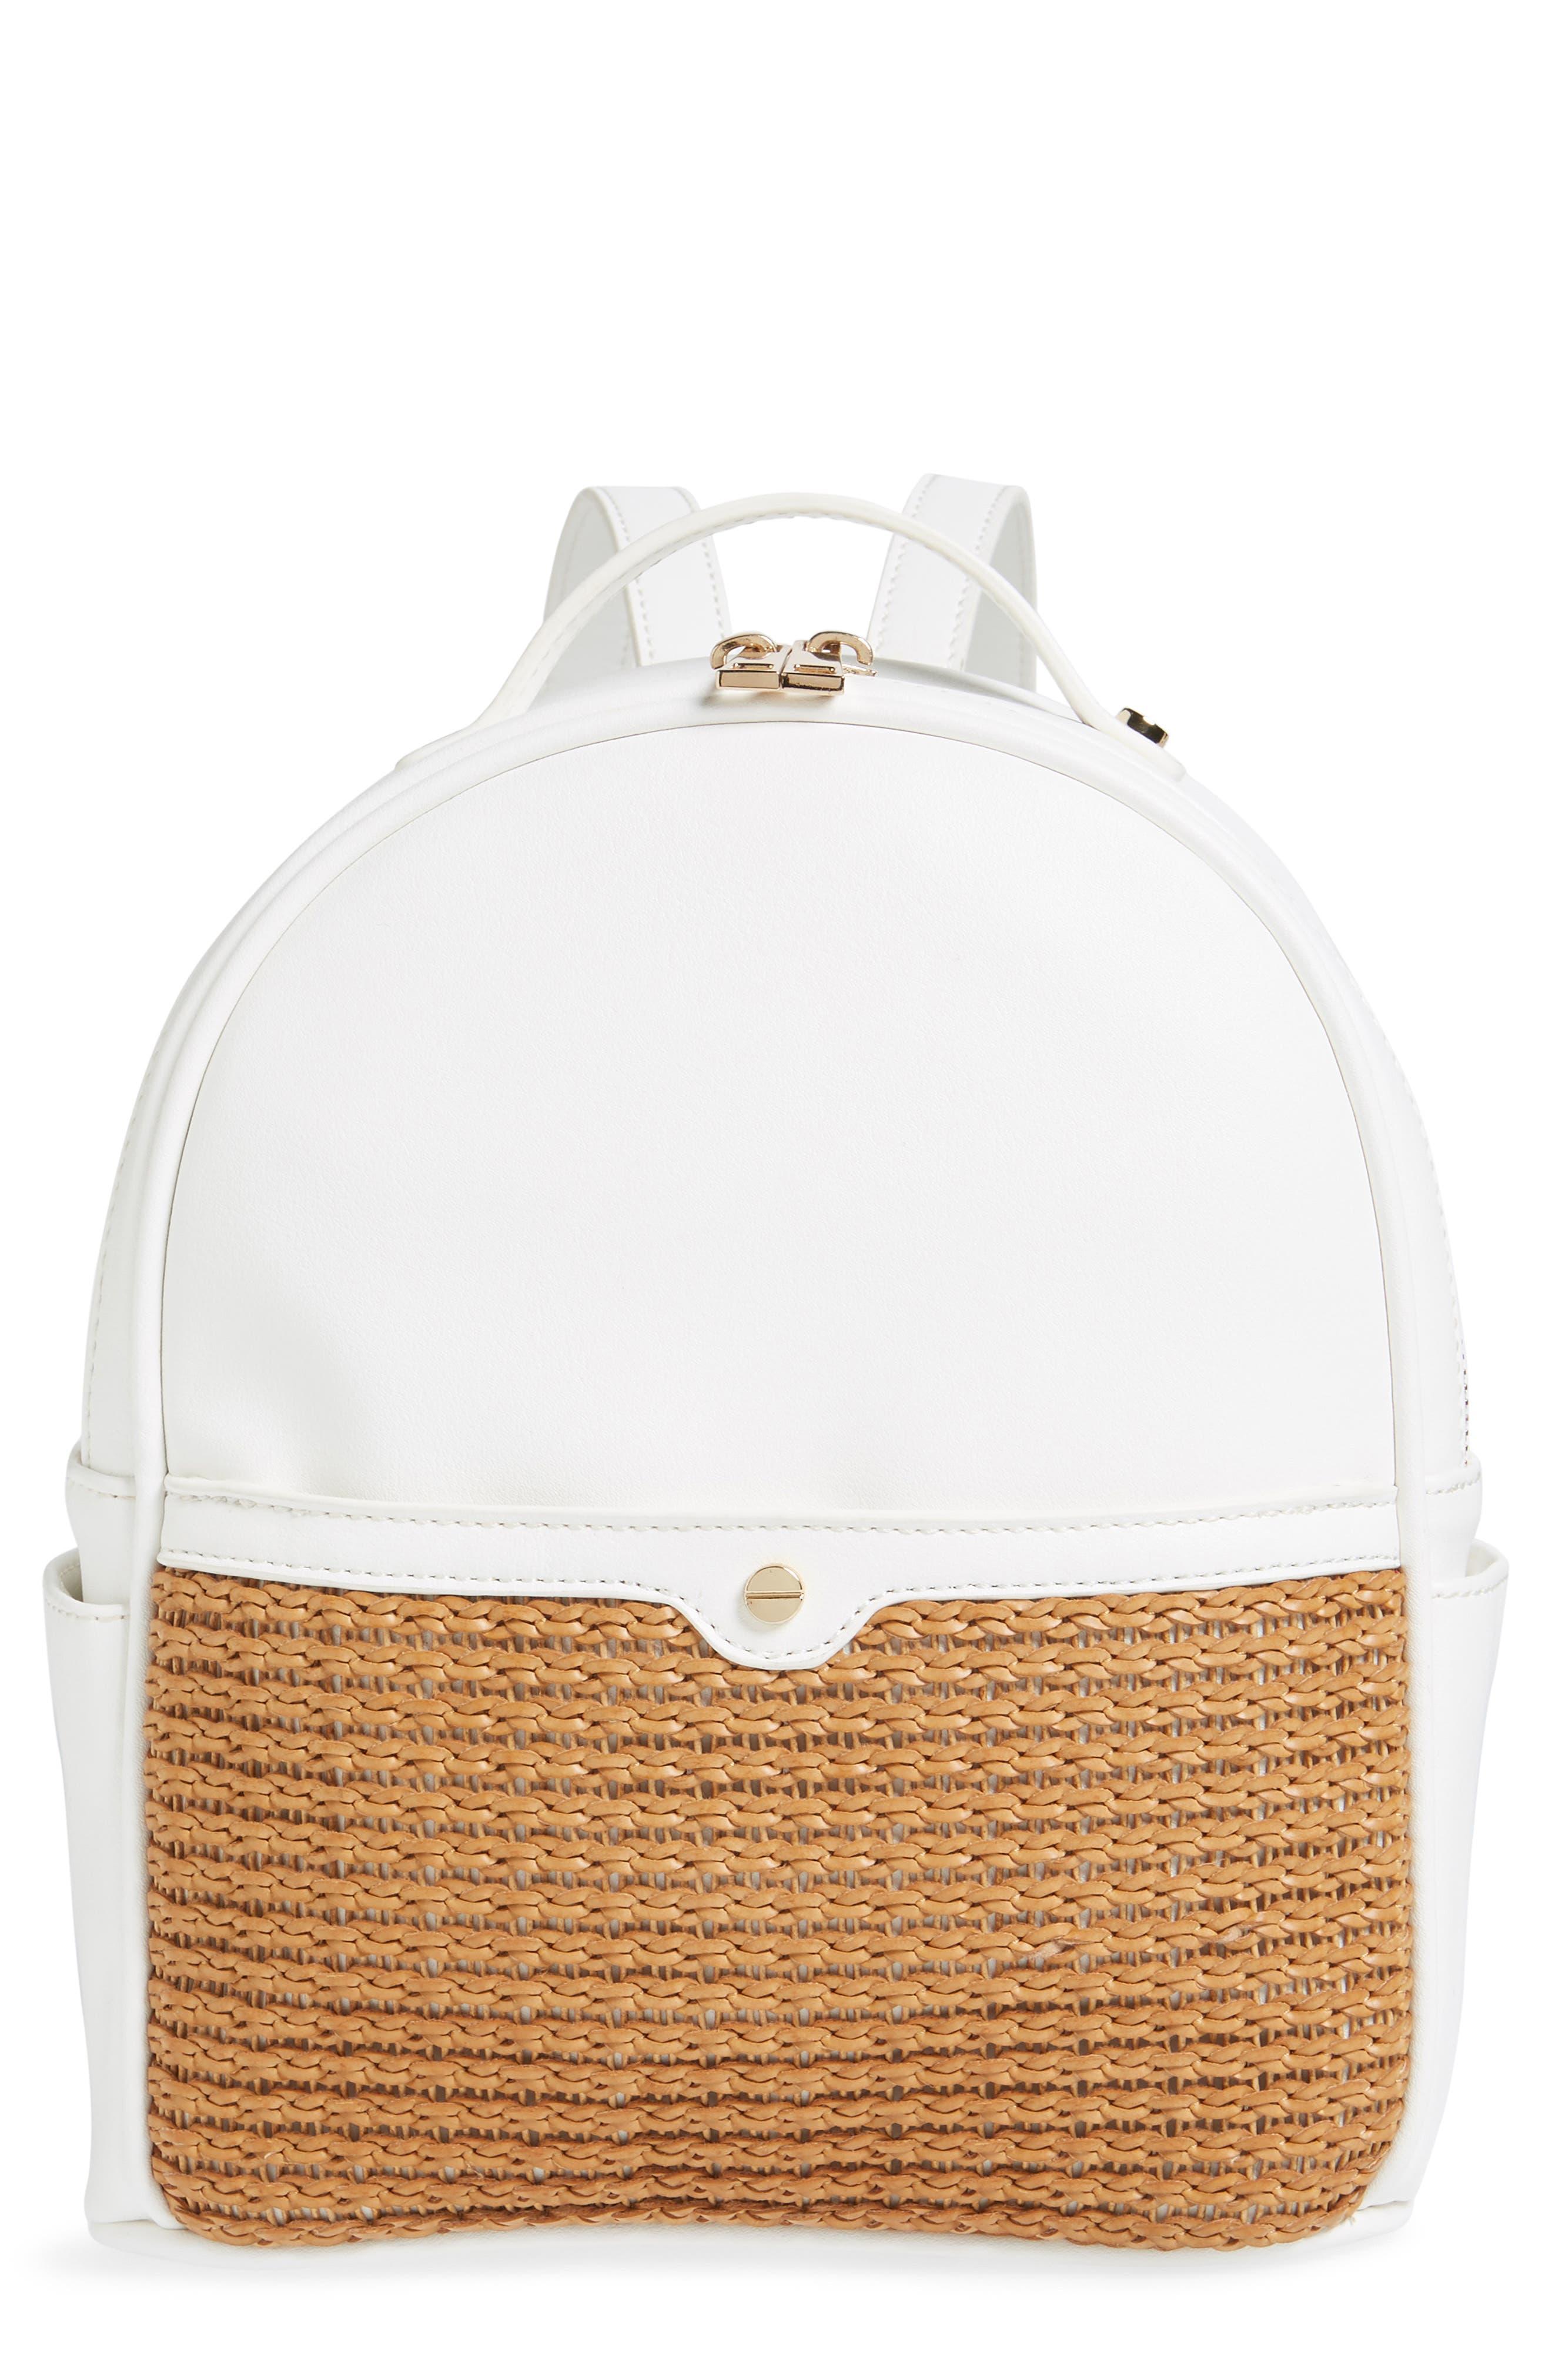 Mali + Lili Harper Lili Basket Weave Backpack,                             Main thumbnail 1, color,                             White